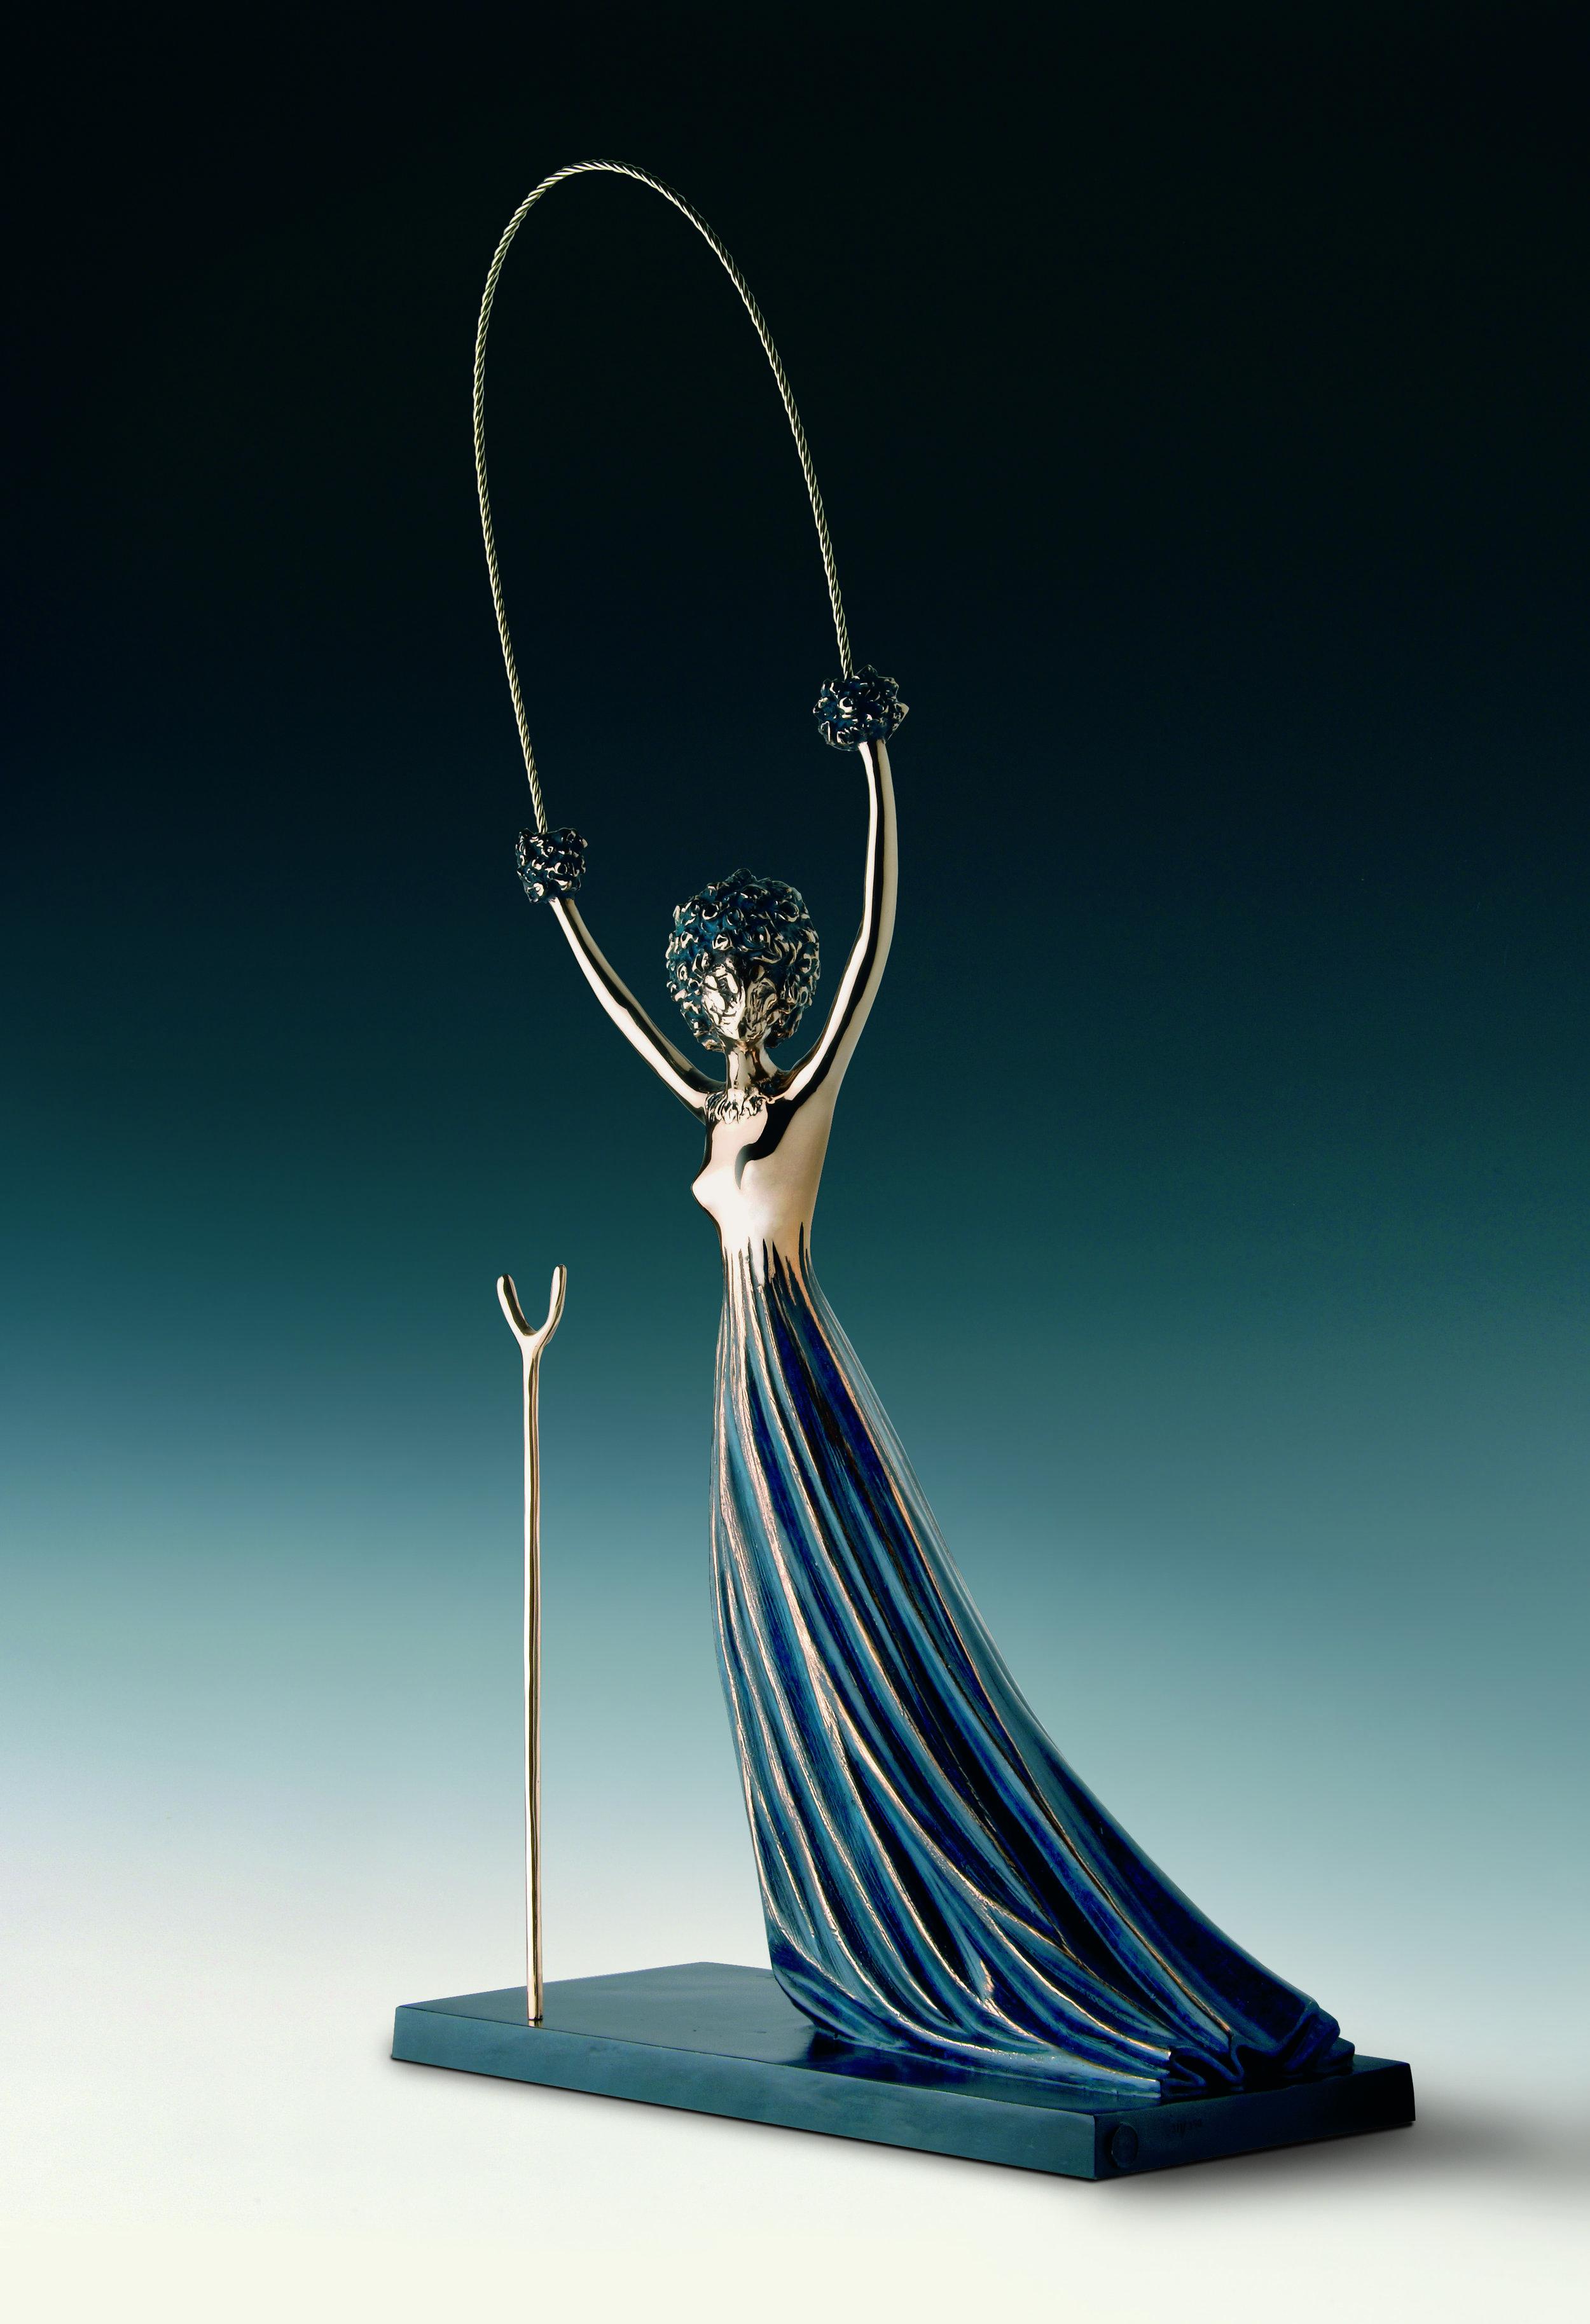 """Alice In Wonderland Sculpture"" by Salvador Dali © I.A.R Art Resources"